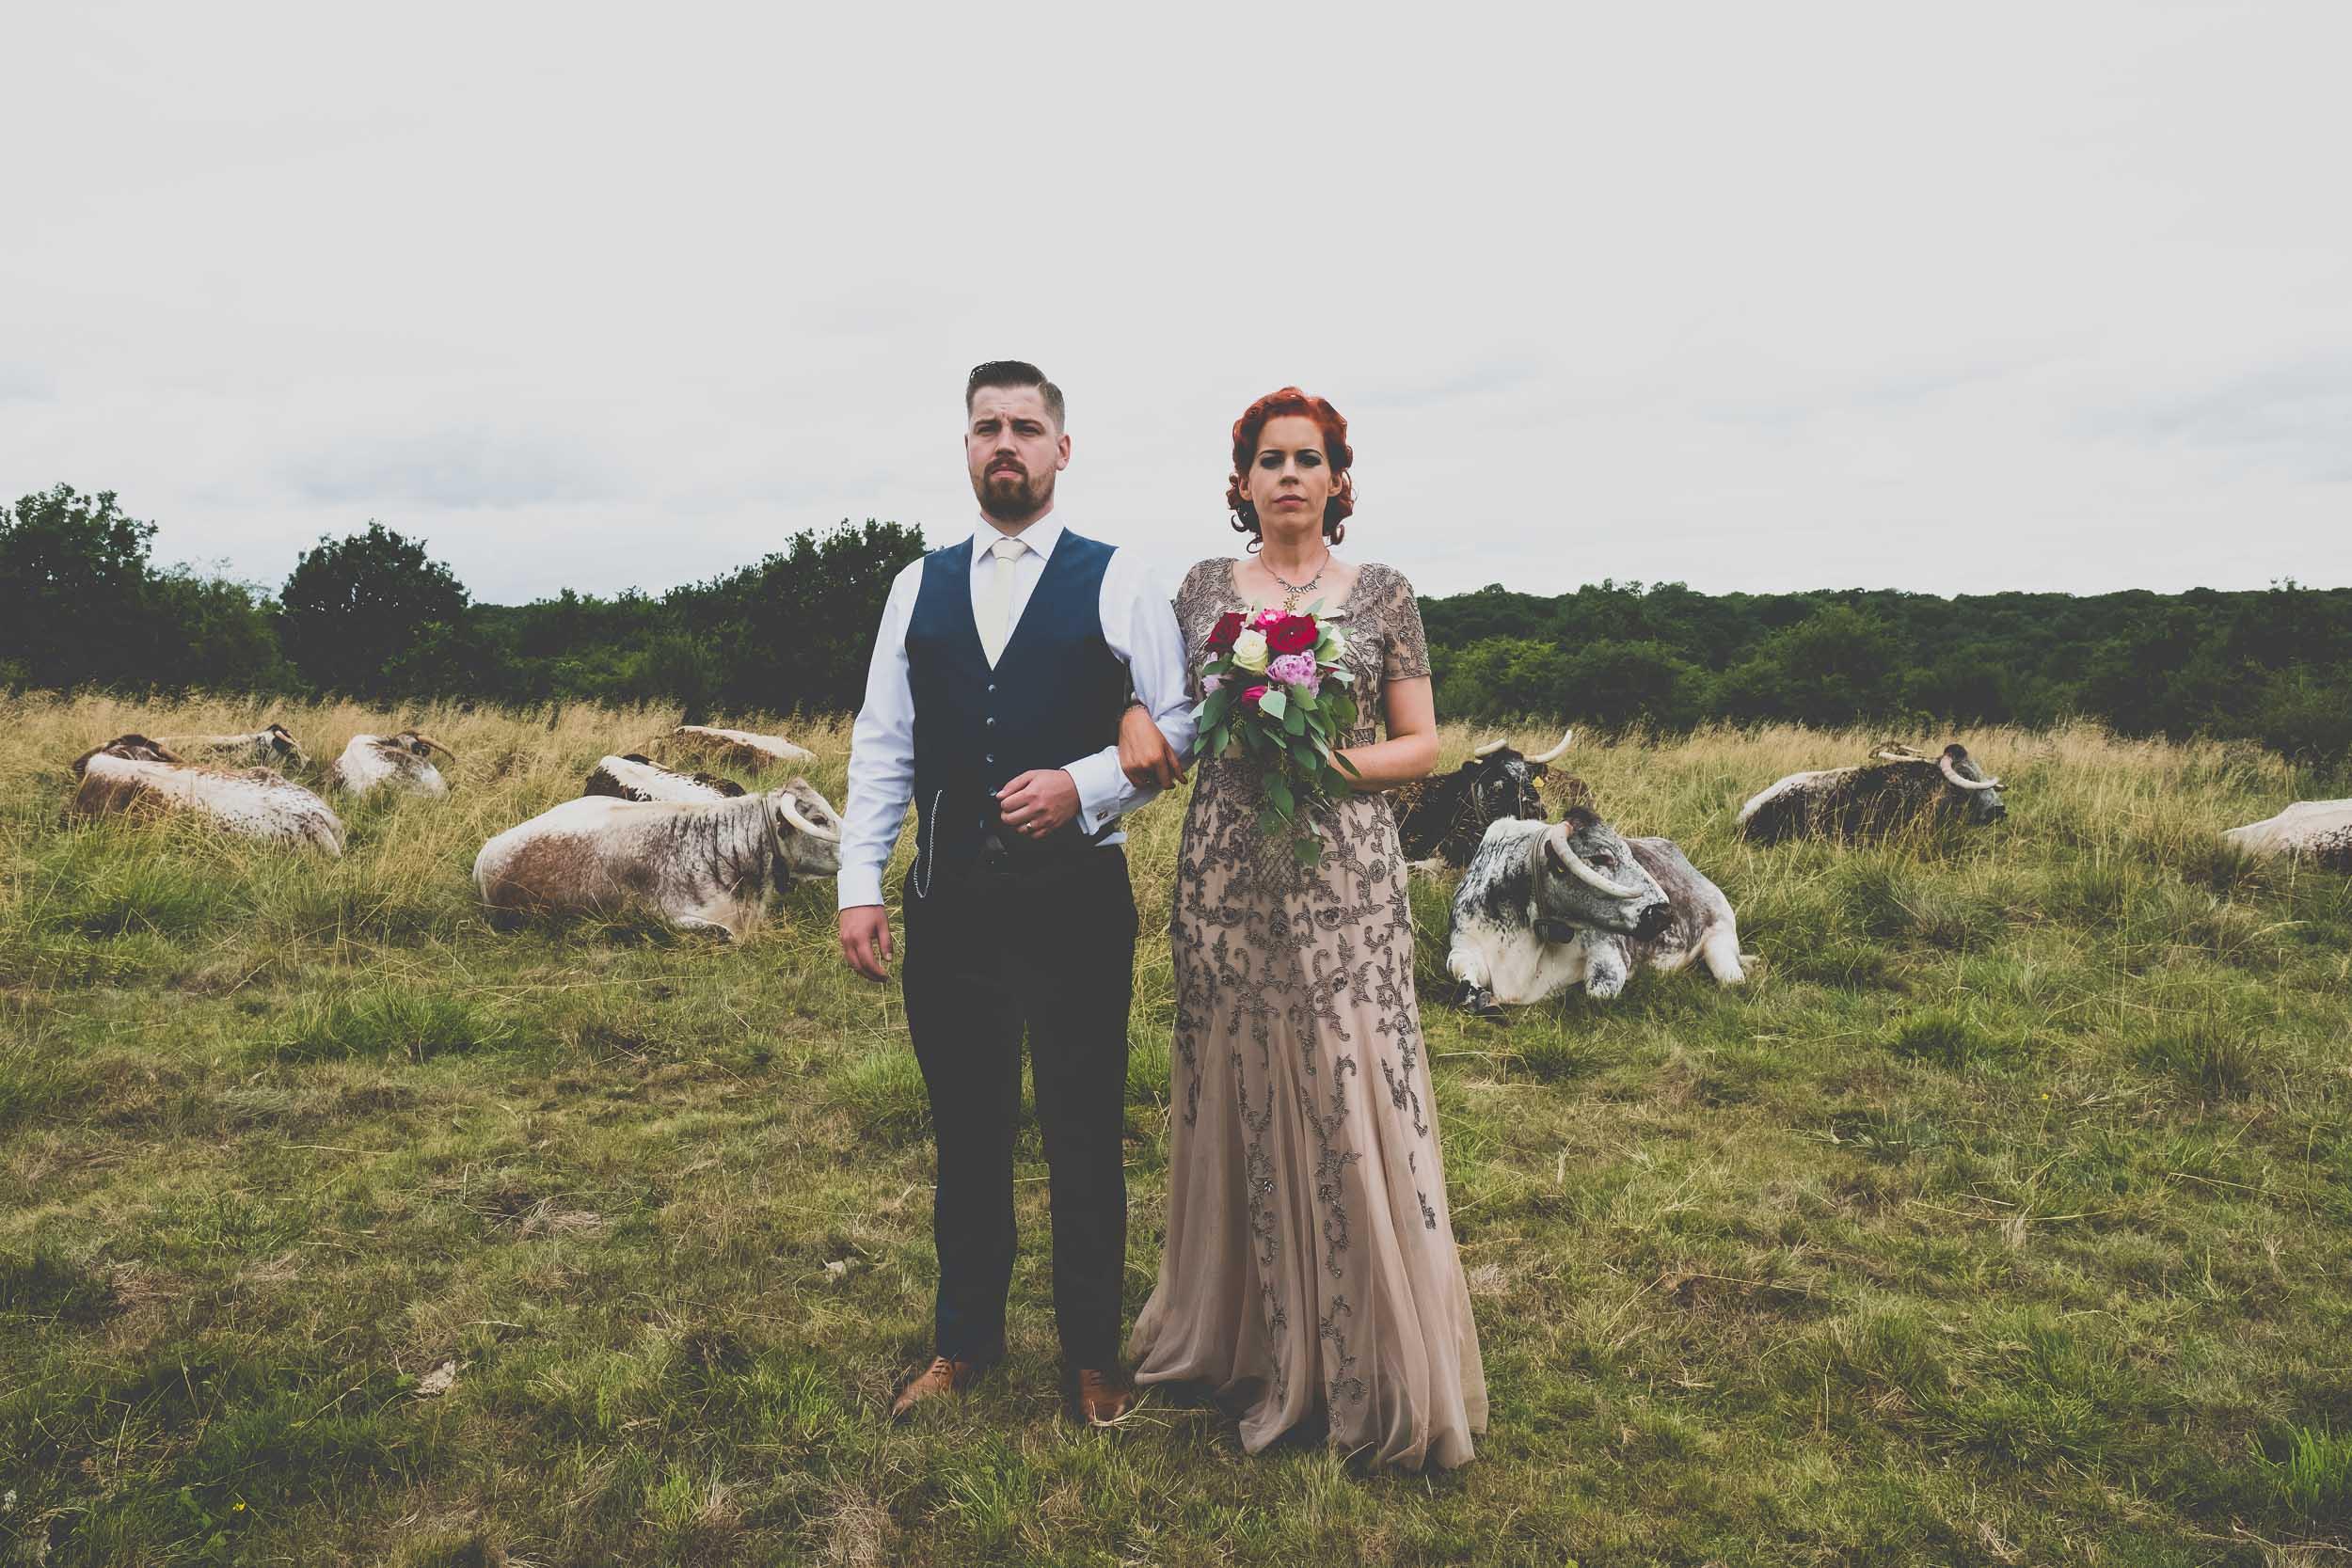 queen-elizabeths-hunting-lodge-epping-forest-wedding245.jpg